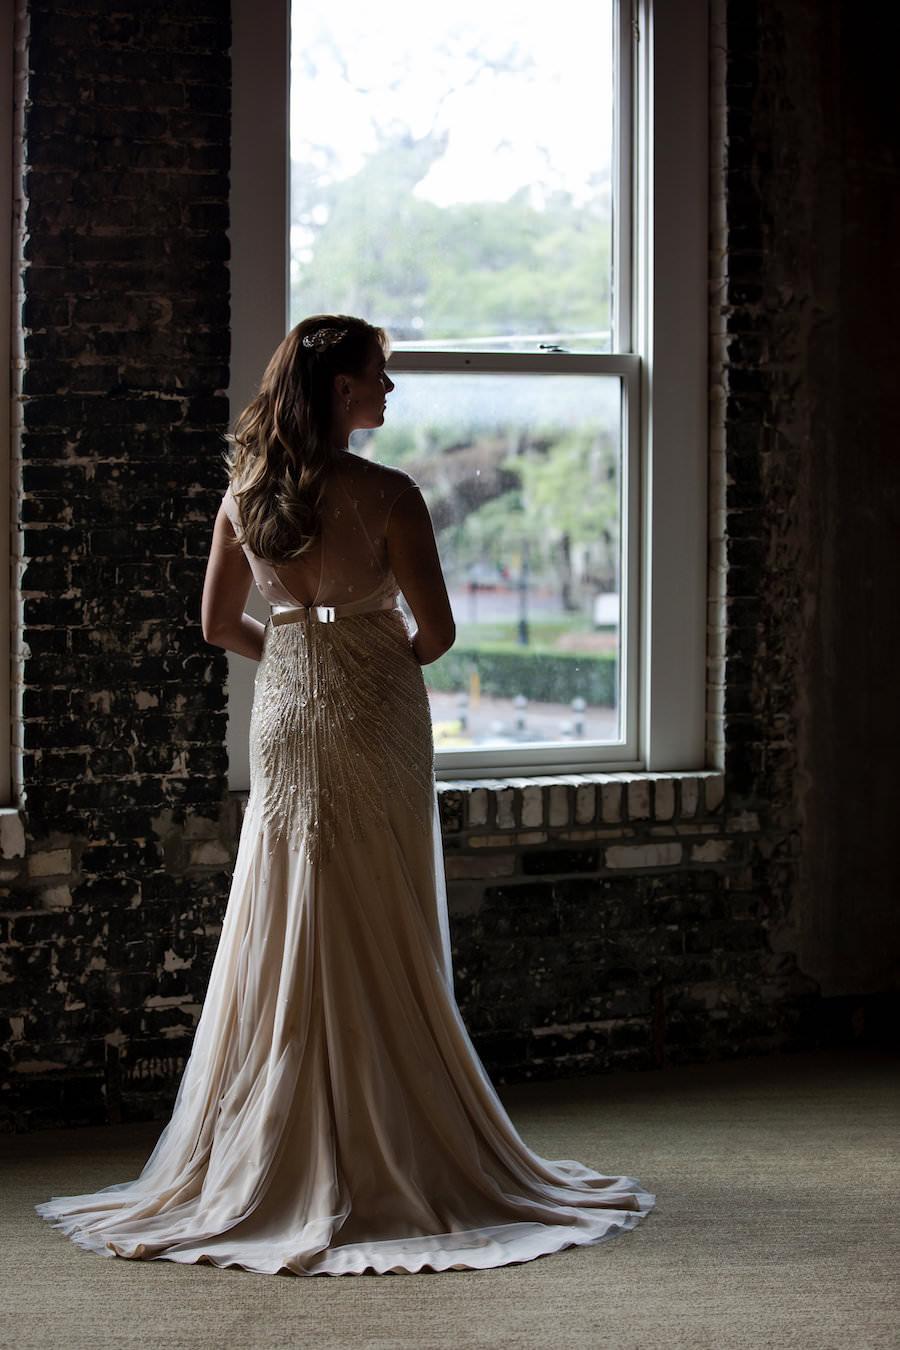 Bridal Wedding Portrait in Backless, Beaded Ivory Jenny Packham Wedding Dress with Court Train